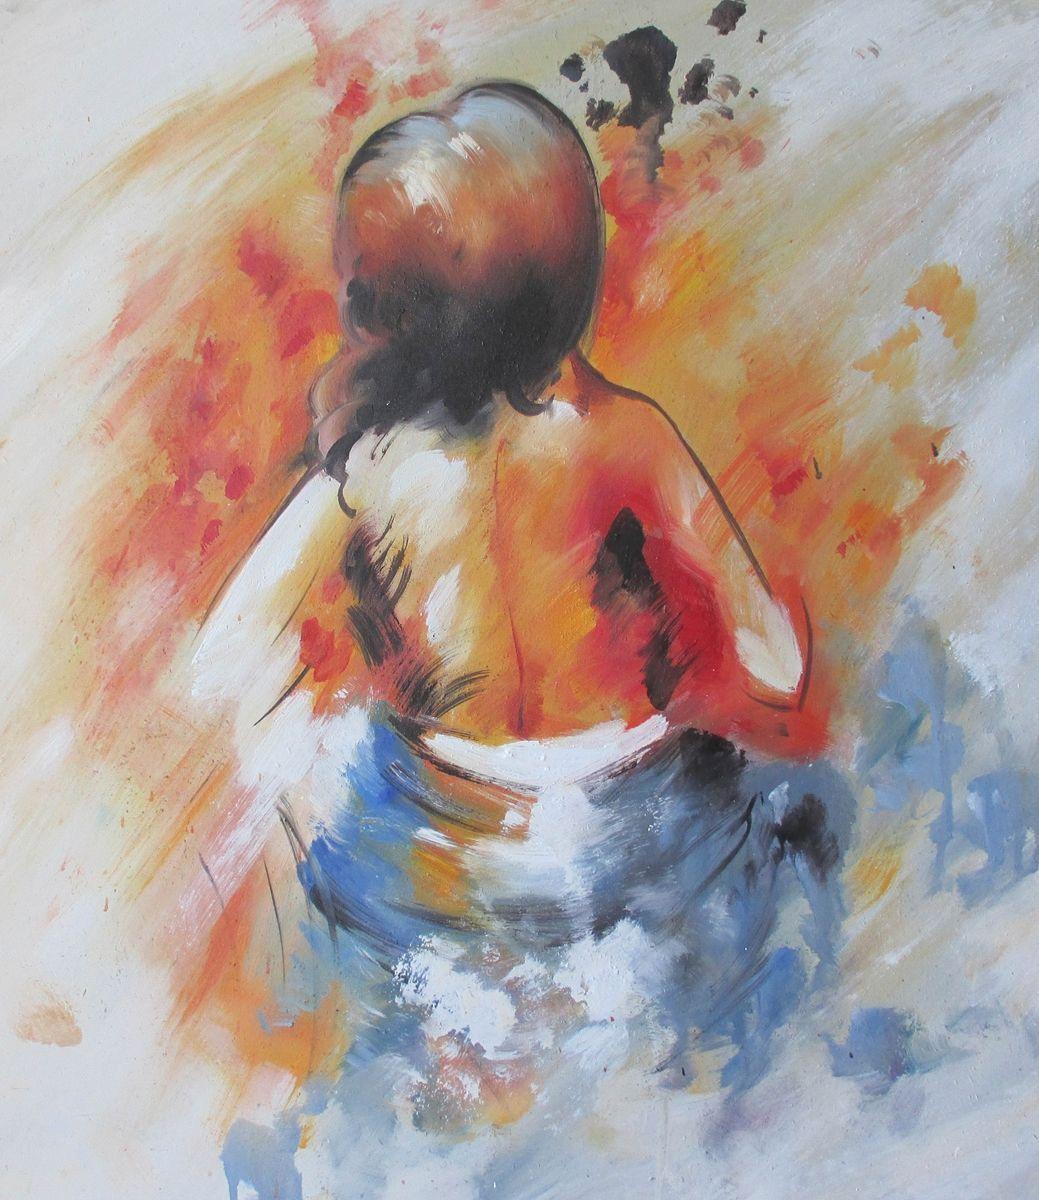 THE OPPOSITE - € 91.35 Sizes:  50x60 Contact us info@chepakko.com Visit our website www.chepakko.com #chepakko #handmade   #pop #popart #vintage #tribal #orientalstyle  #abstract #trends #view #landscape #landscapes  #picture #painting #panel #canvas #oilcolors #oilpaint #art #artist #retrospective